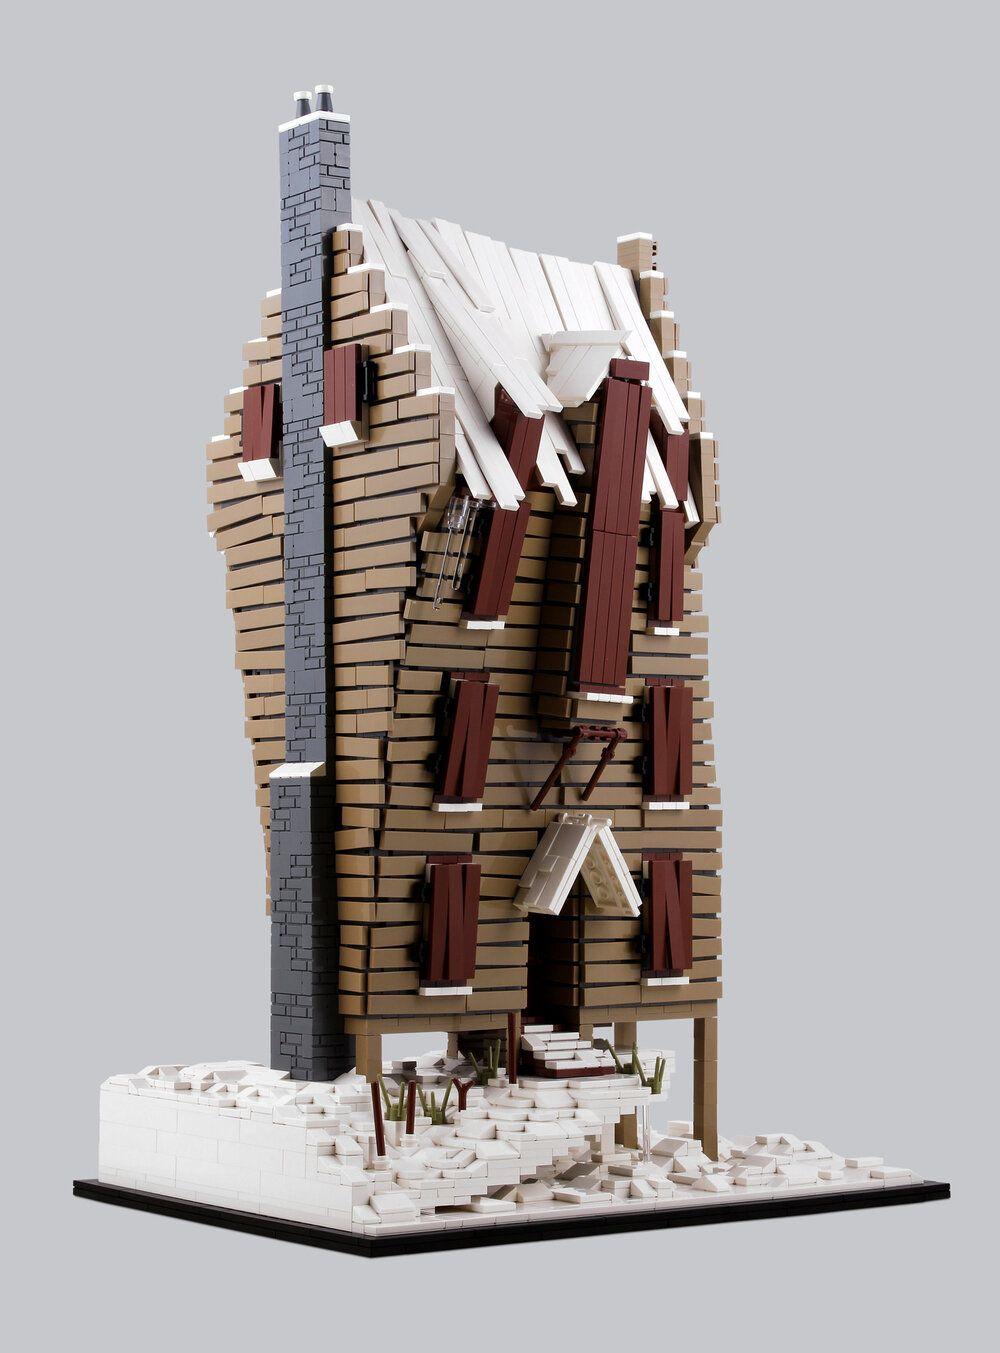 The Shrieking Shack Bricknerd Your Place For All Things Lego And The Lego Fan Community Lego Hogwarts Lego Lego Harry Potter